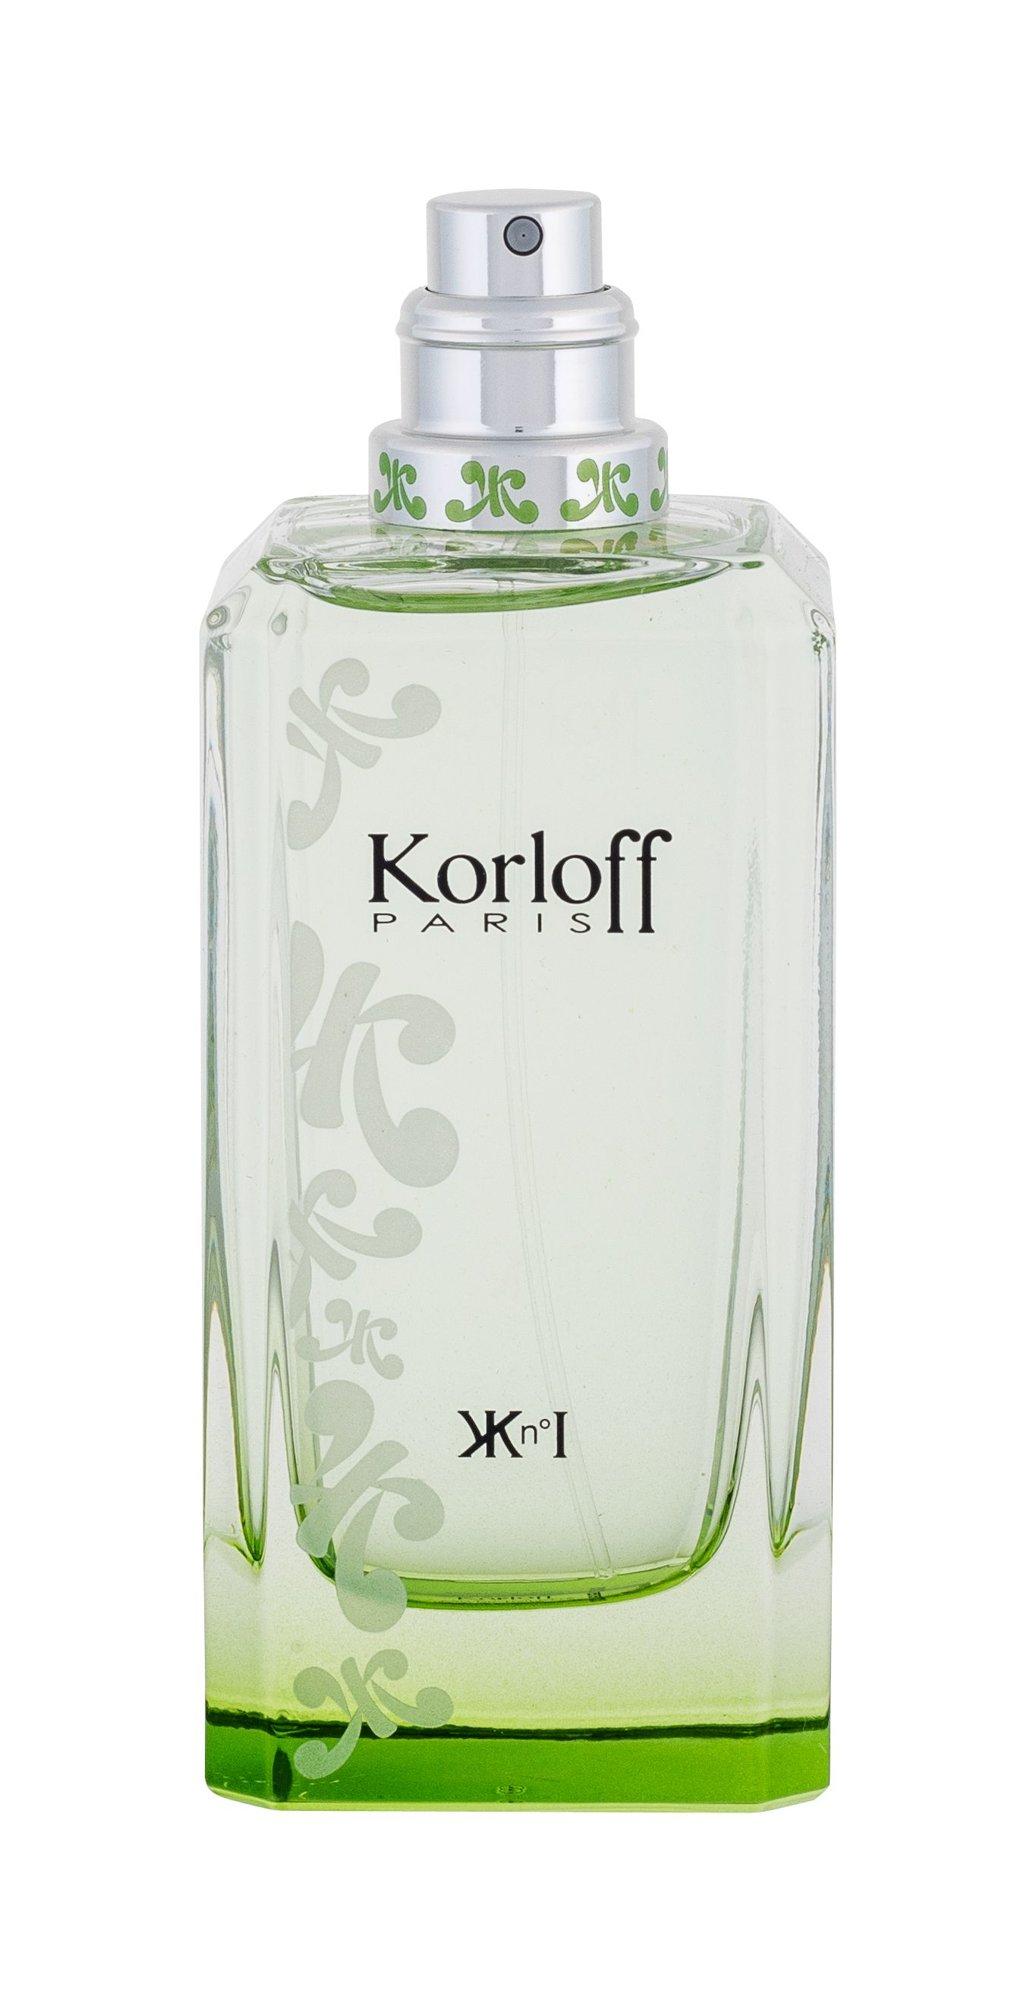 Korloff Paris Kn° I Eau de Toilette 88ml